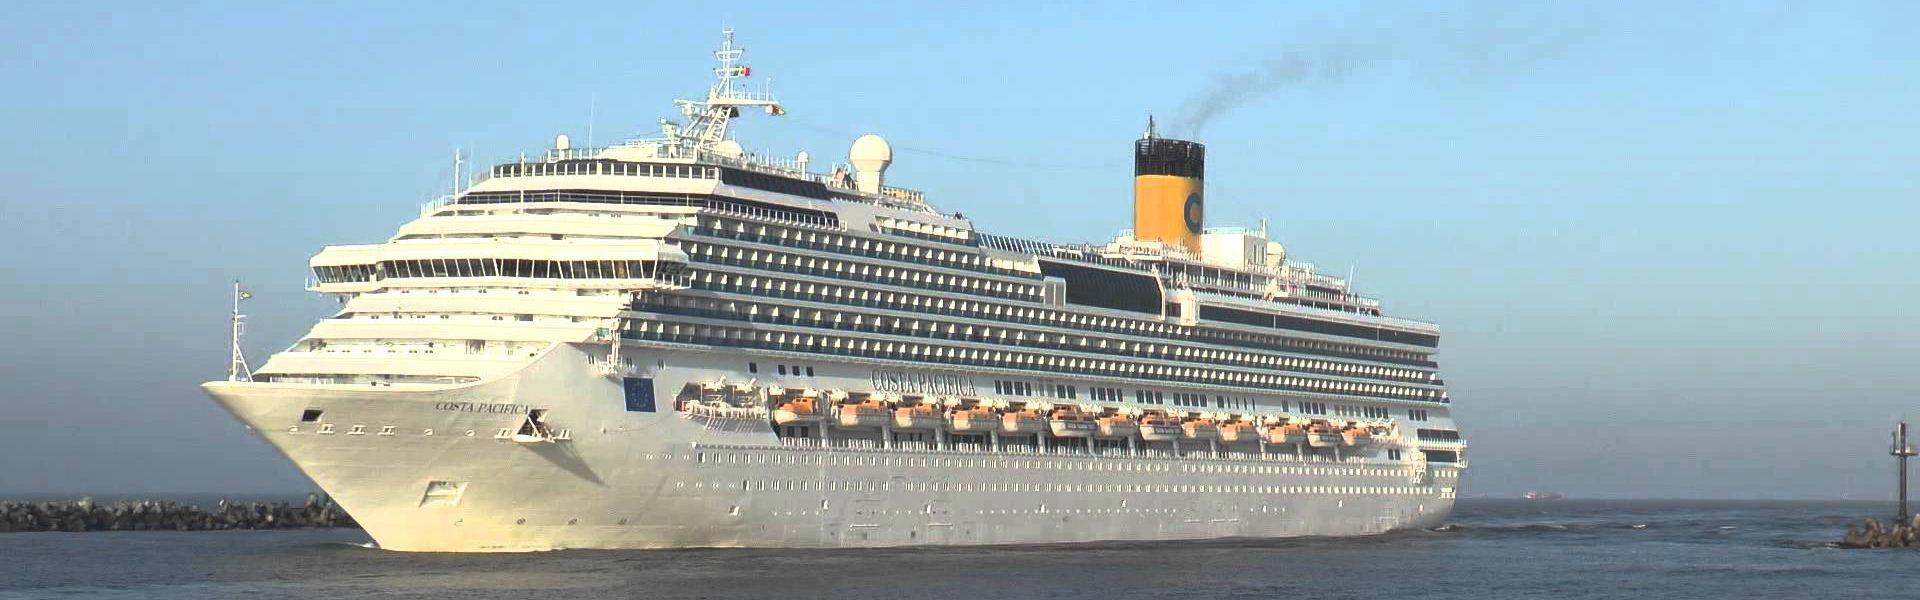 Croaziera 2017 -  Mediterana de Vest (Savona) - Costa Cruises - Costa Pacifica - 7 nopti